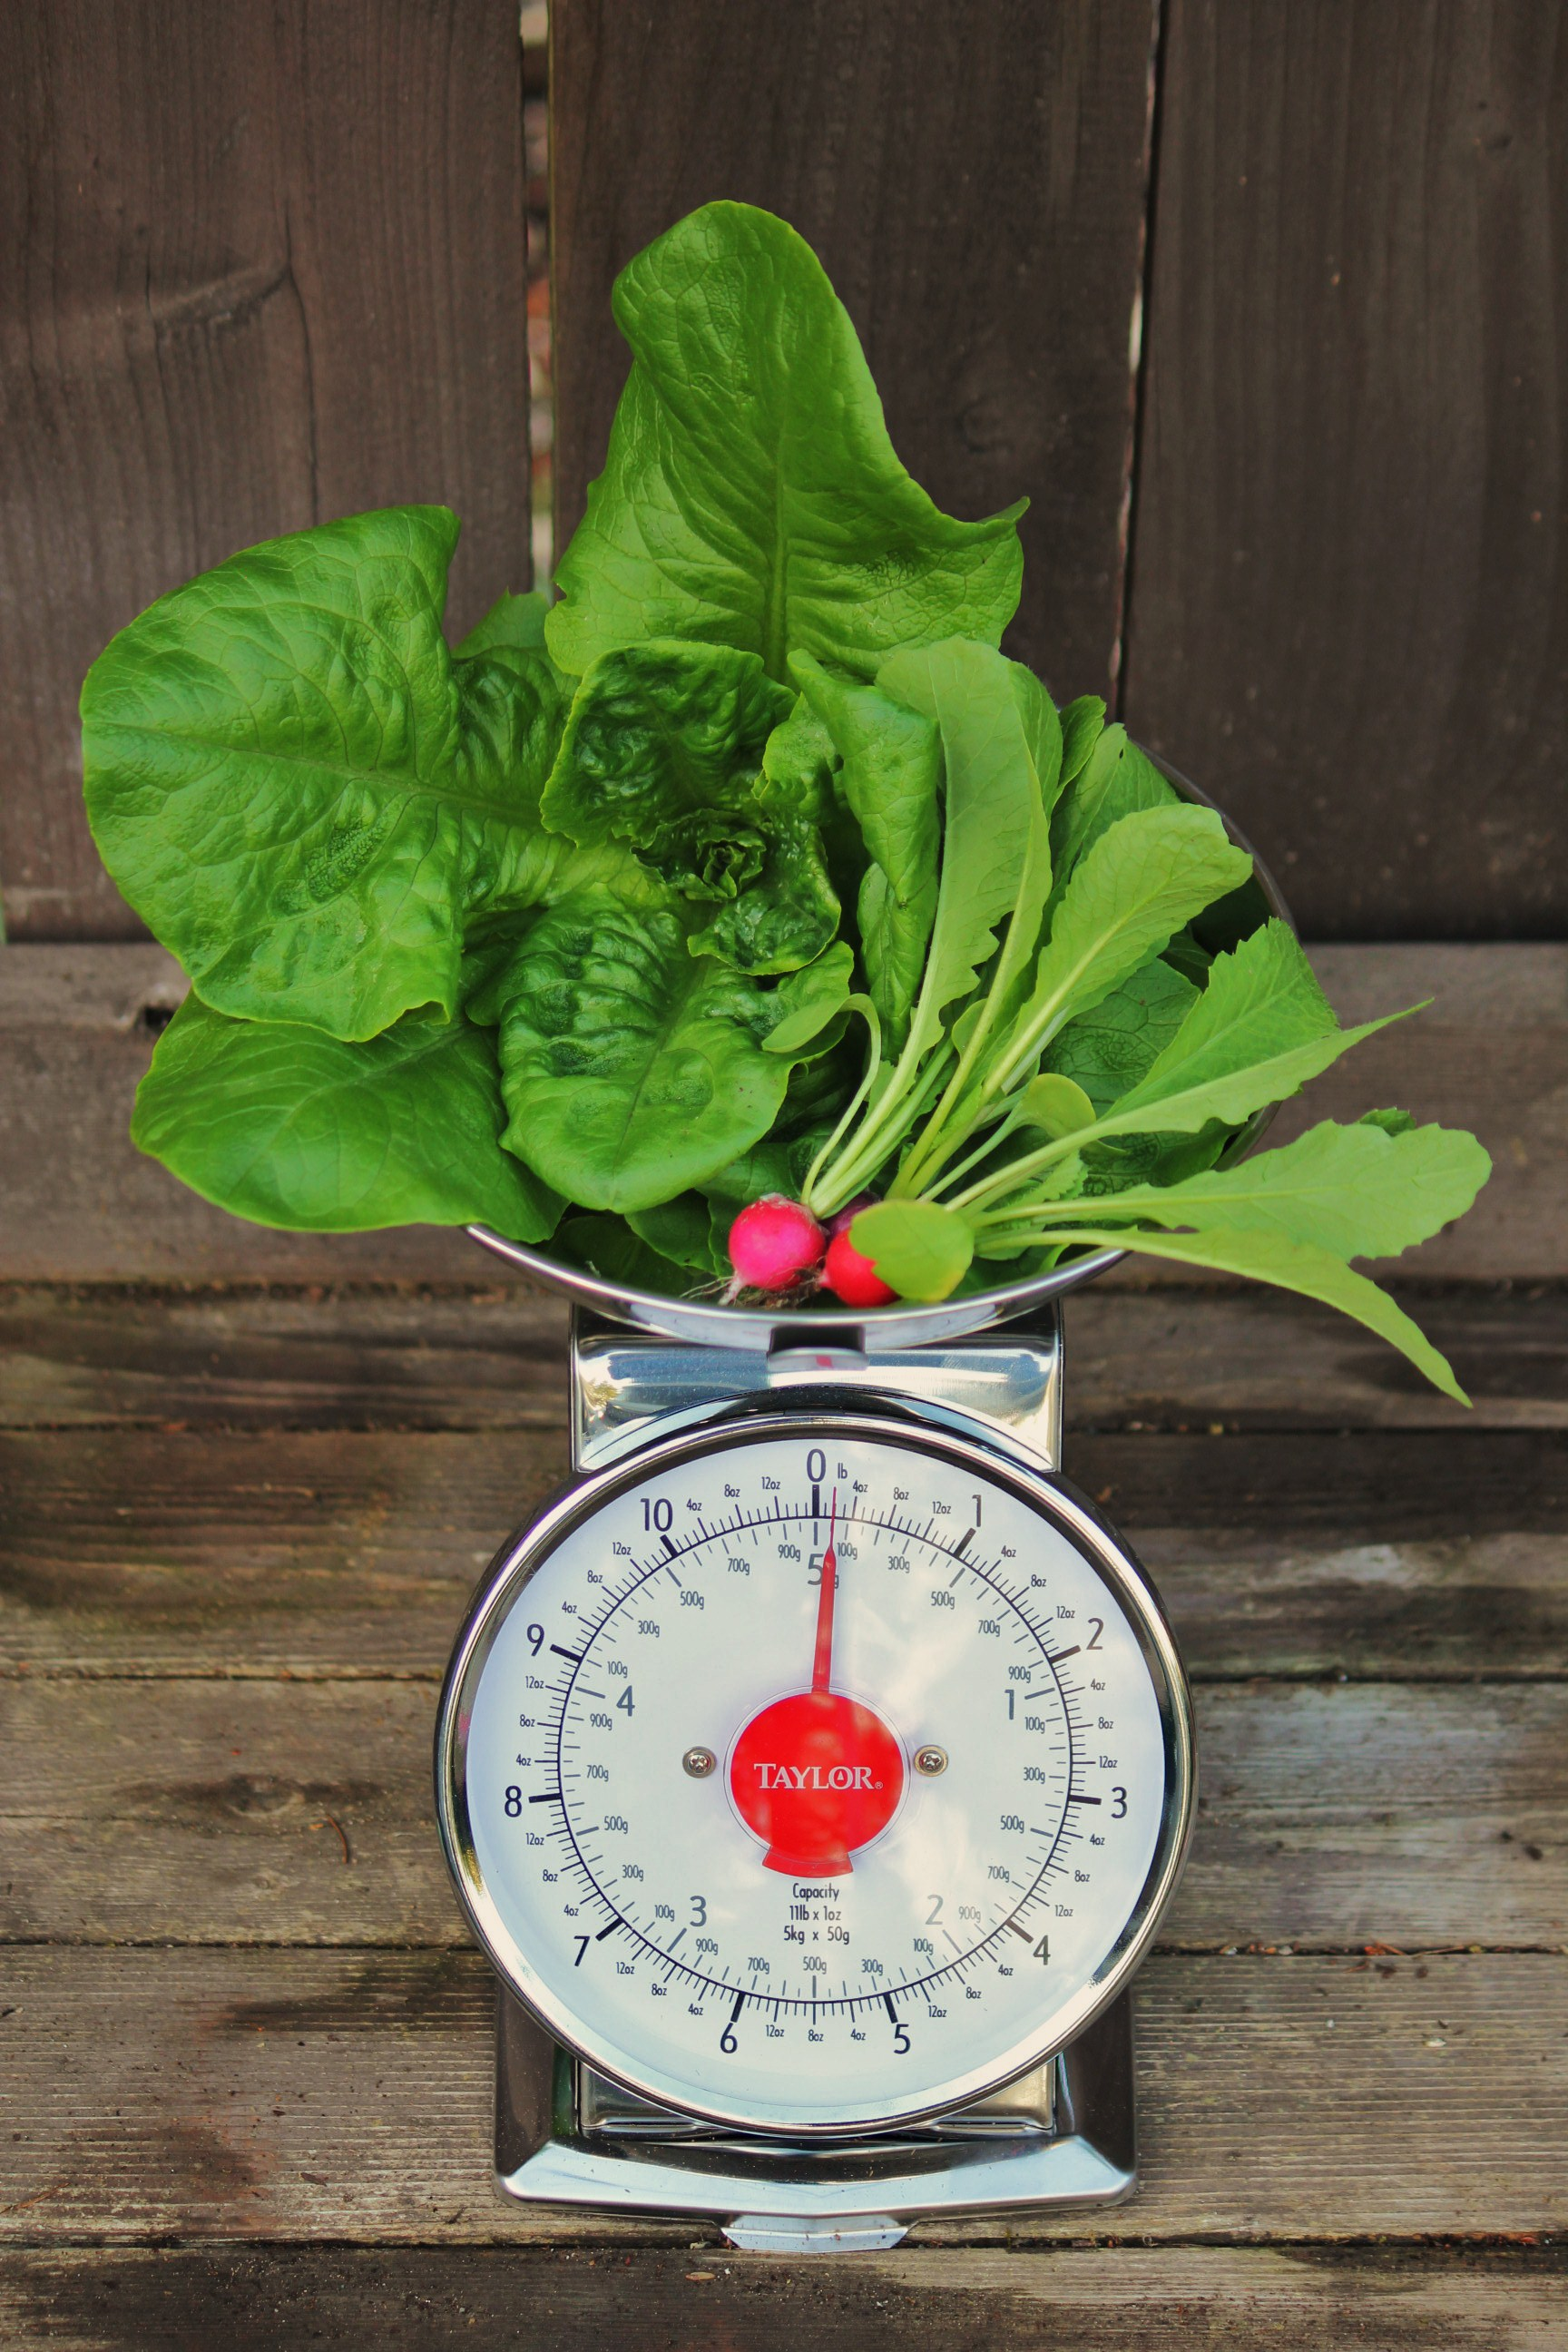 How to Grow Your Own Food: Mavis Invites You on a Garden Tour…